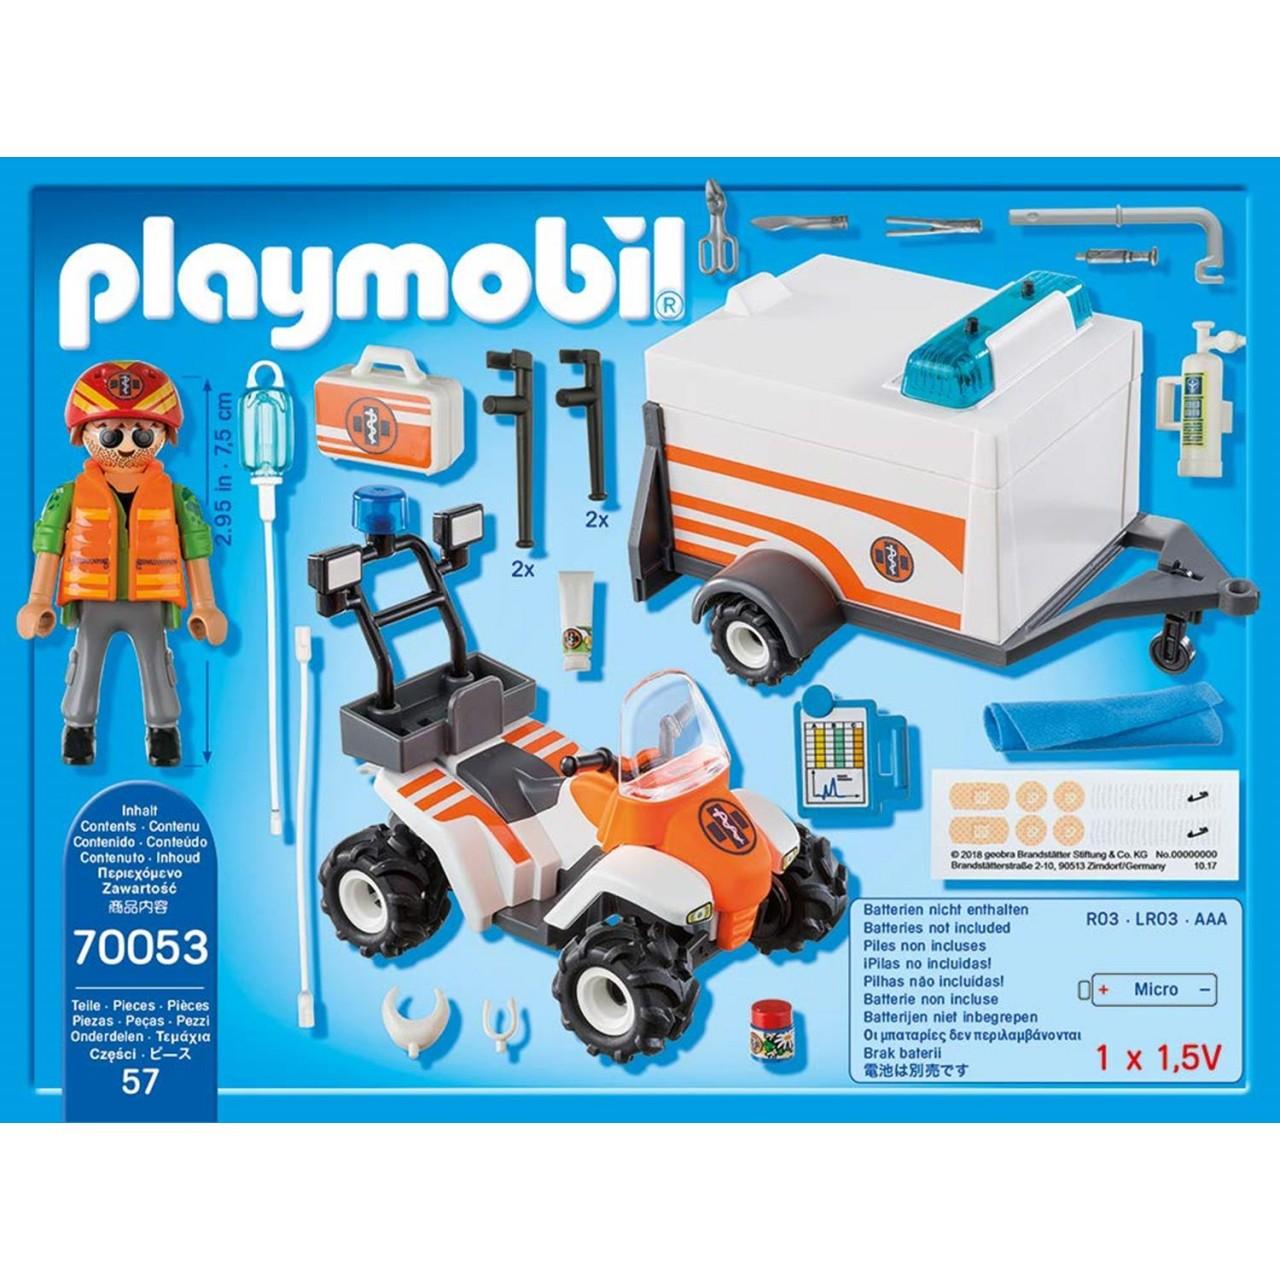 Playmobil 70053 Quad mit Rettungsanhänger